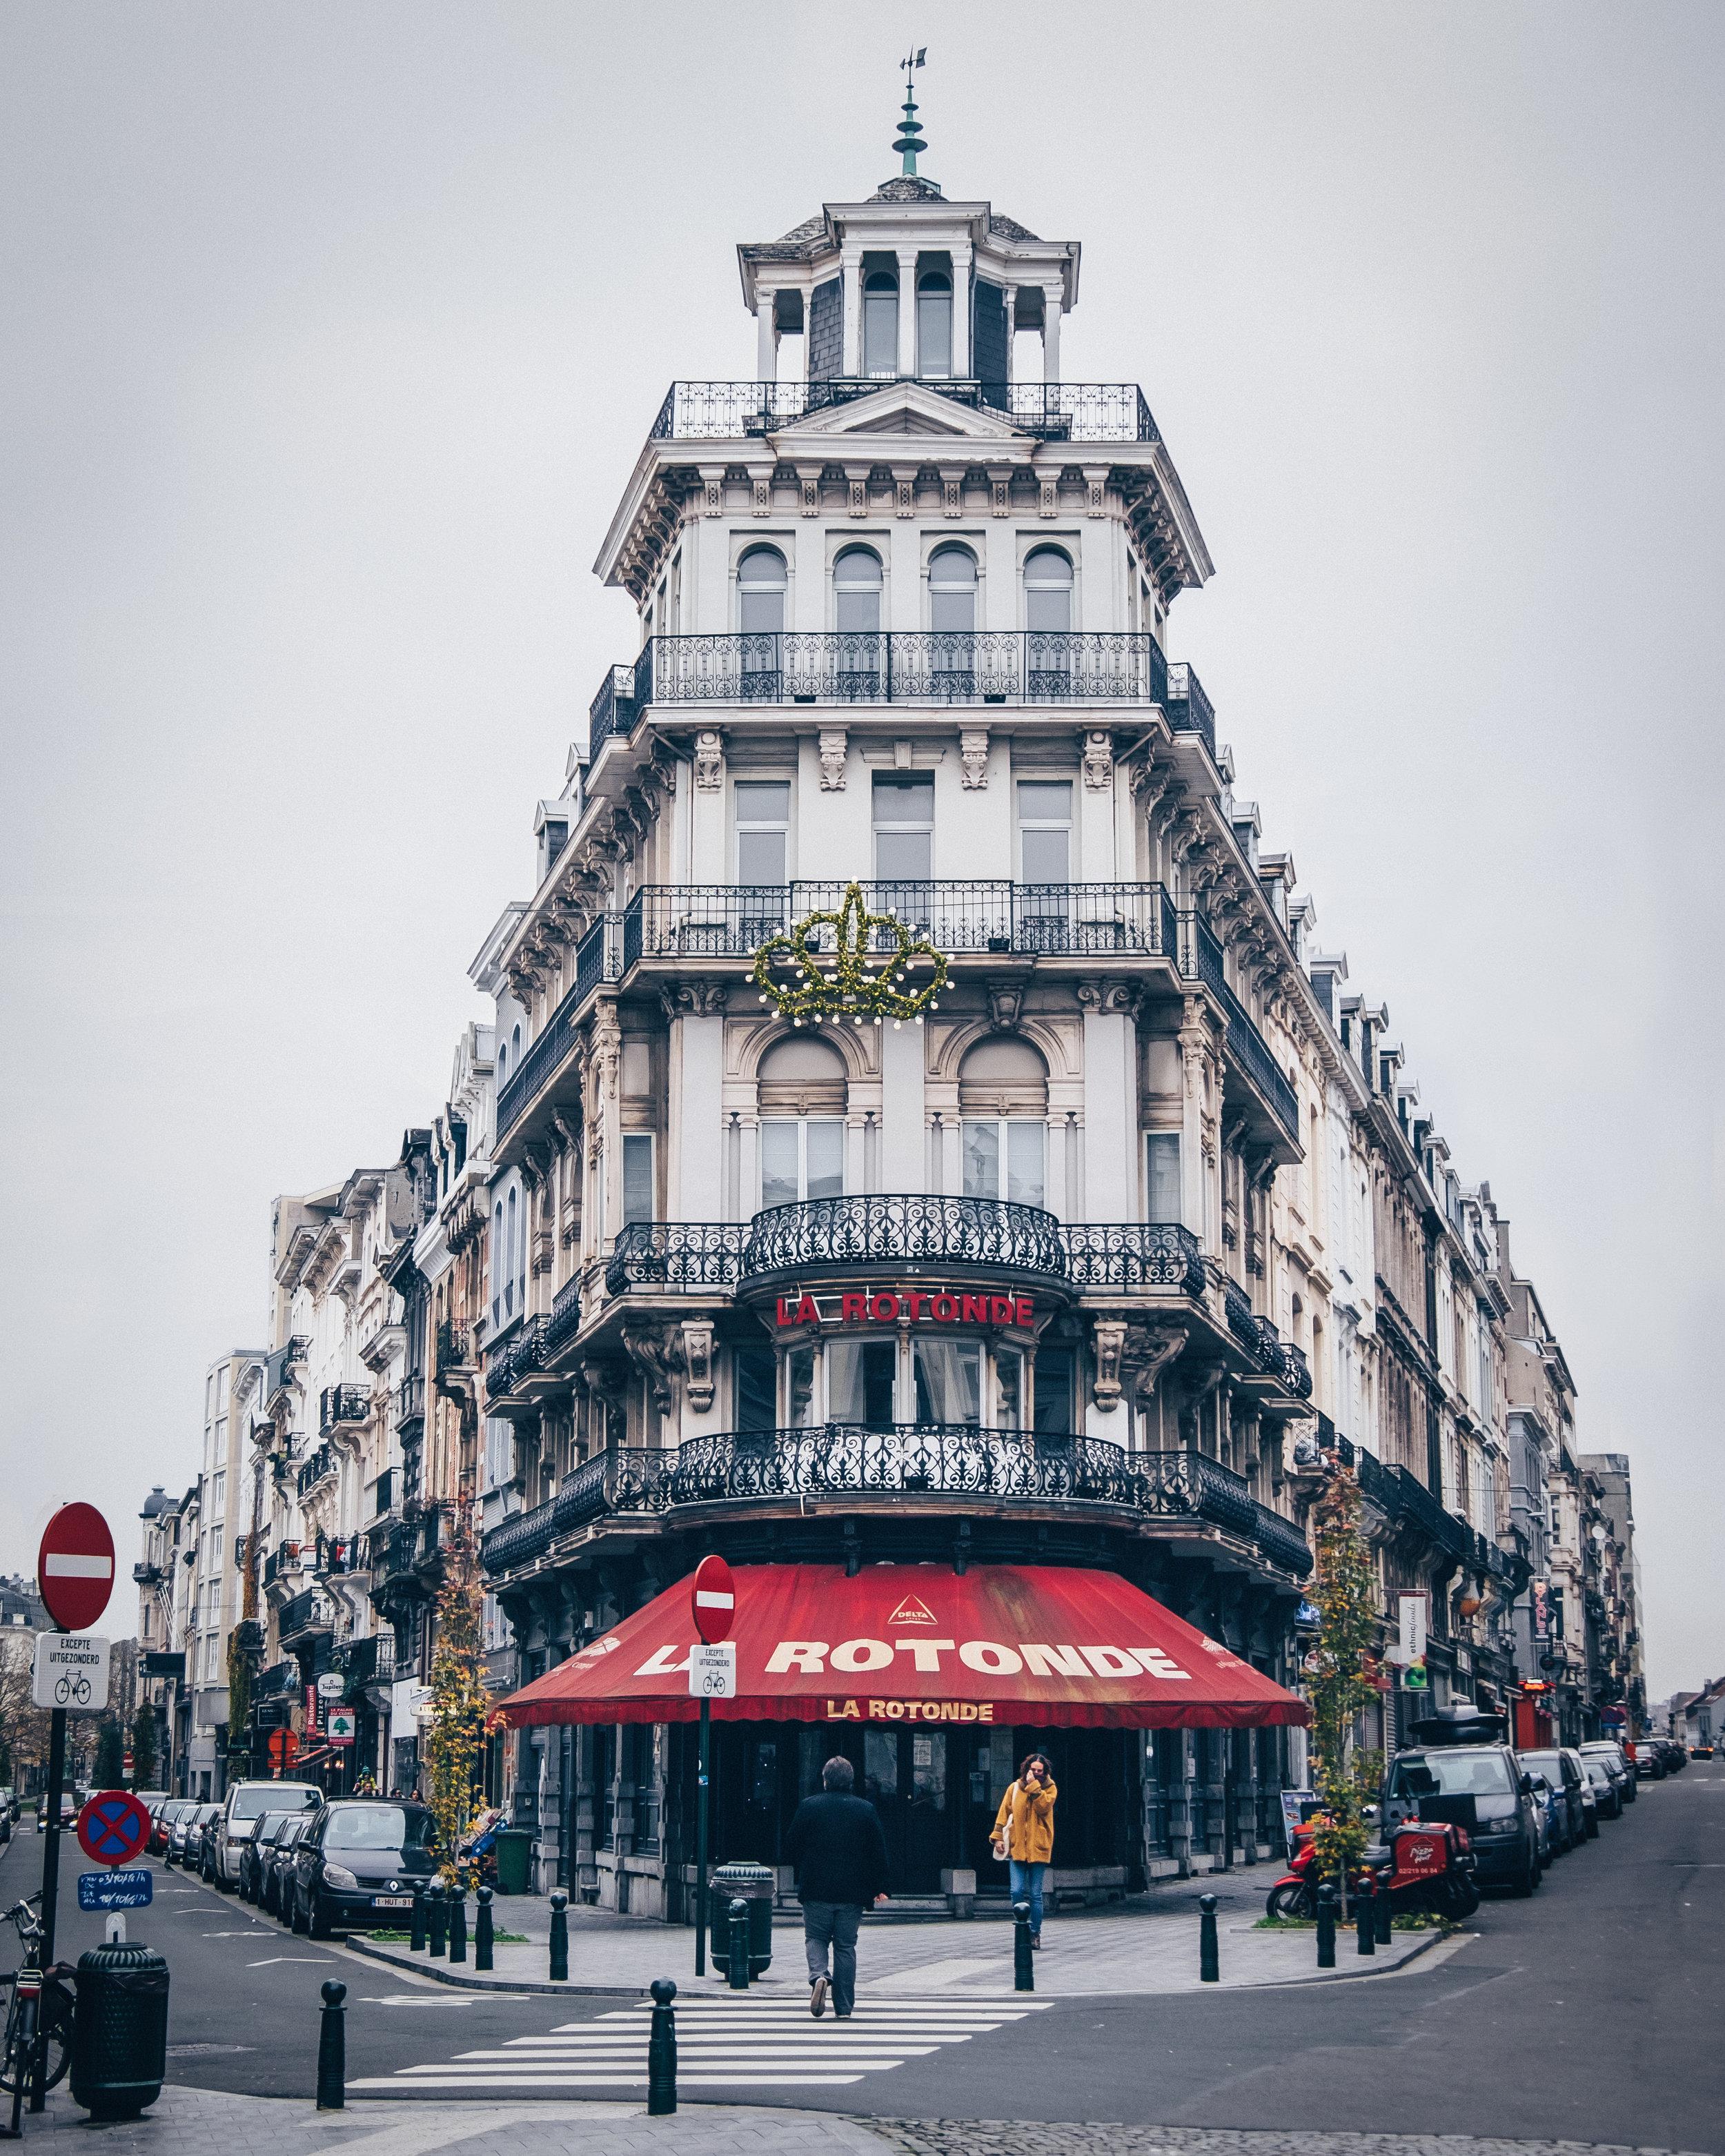 La Rotonda, Brussels